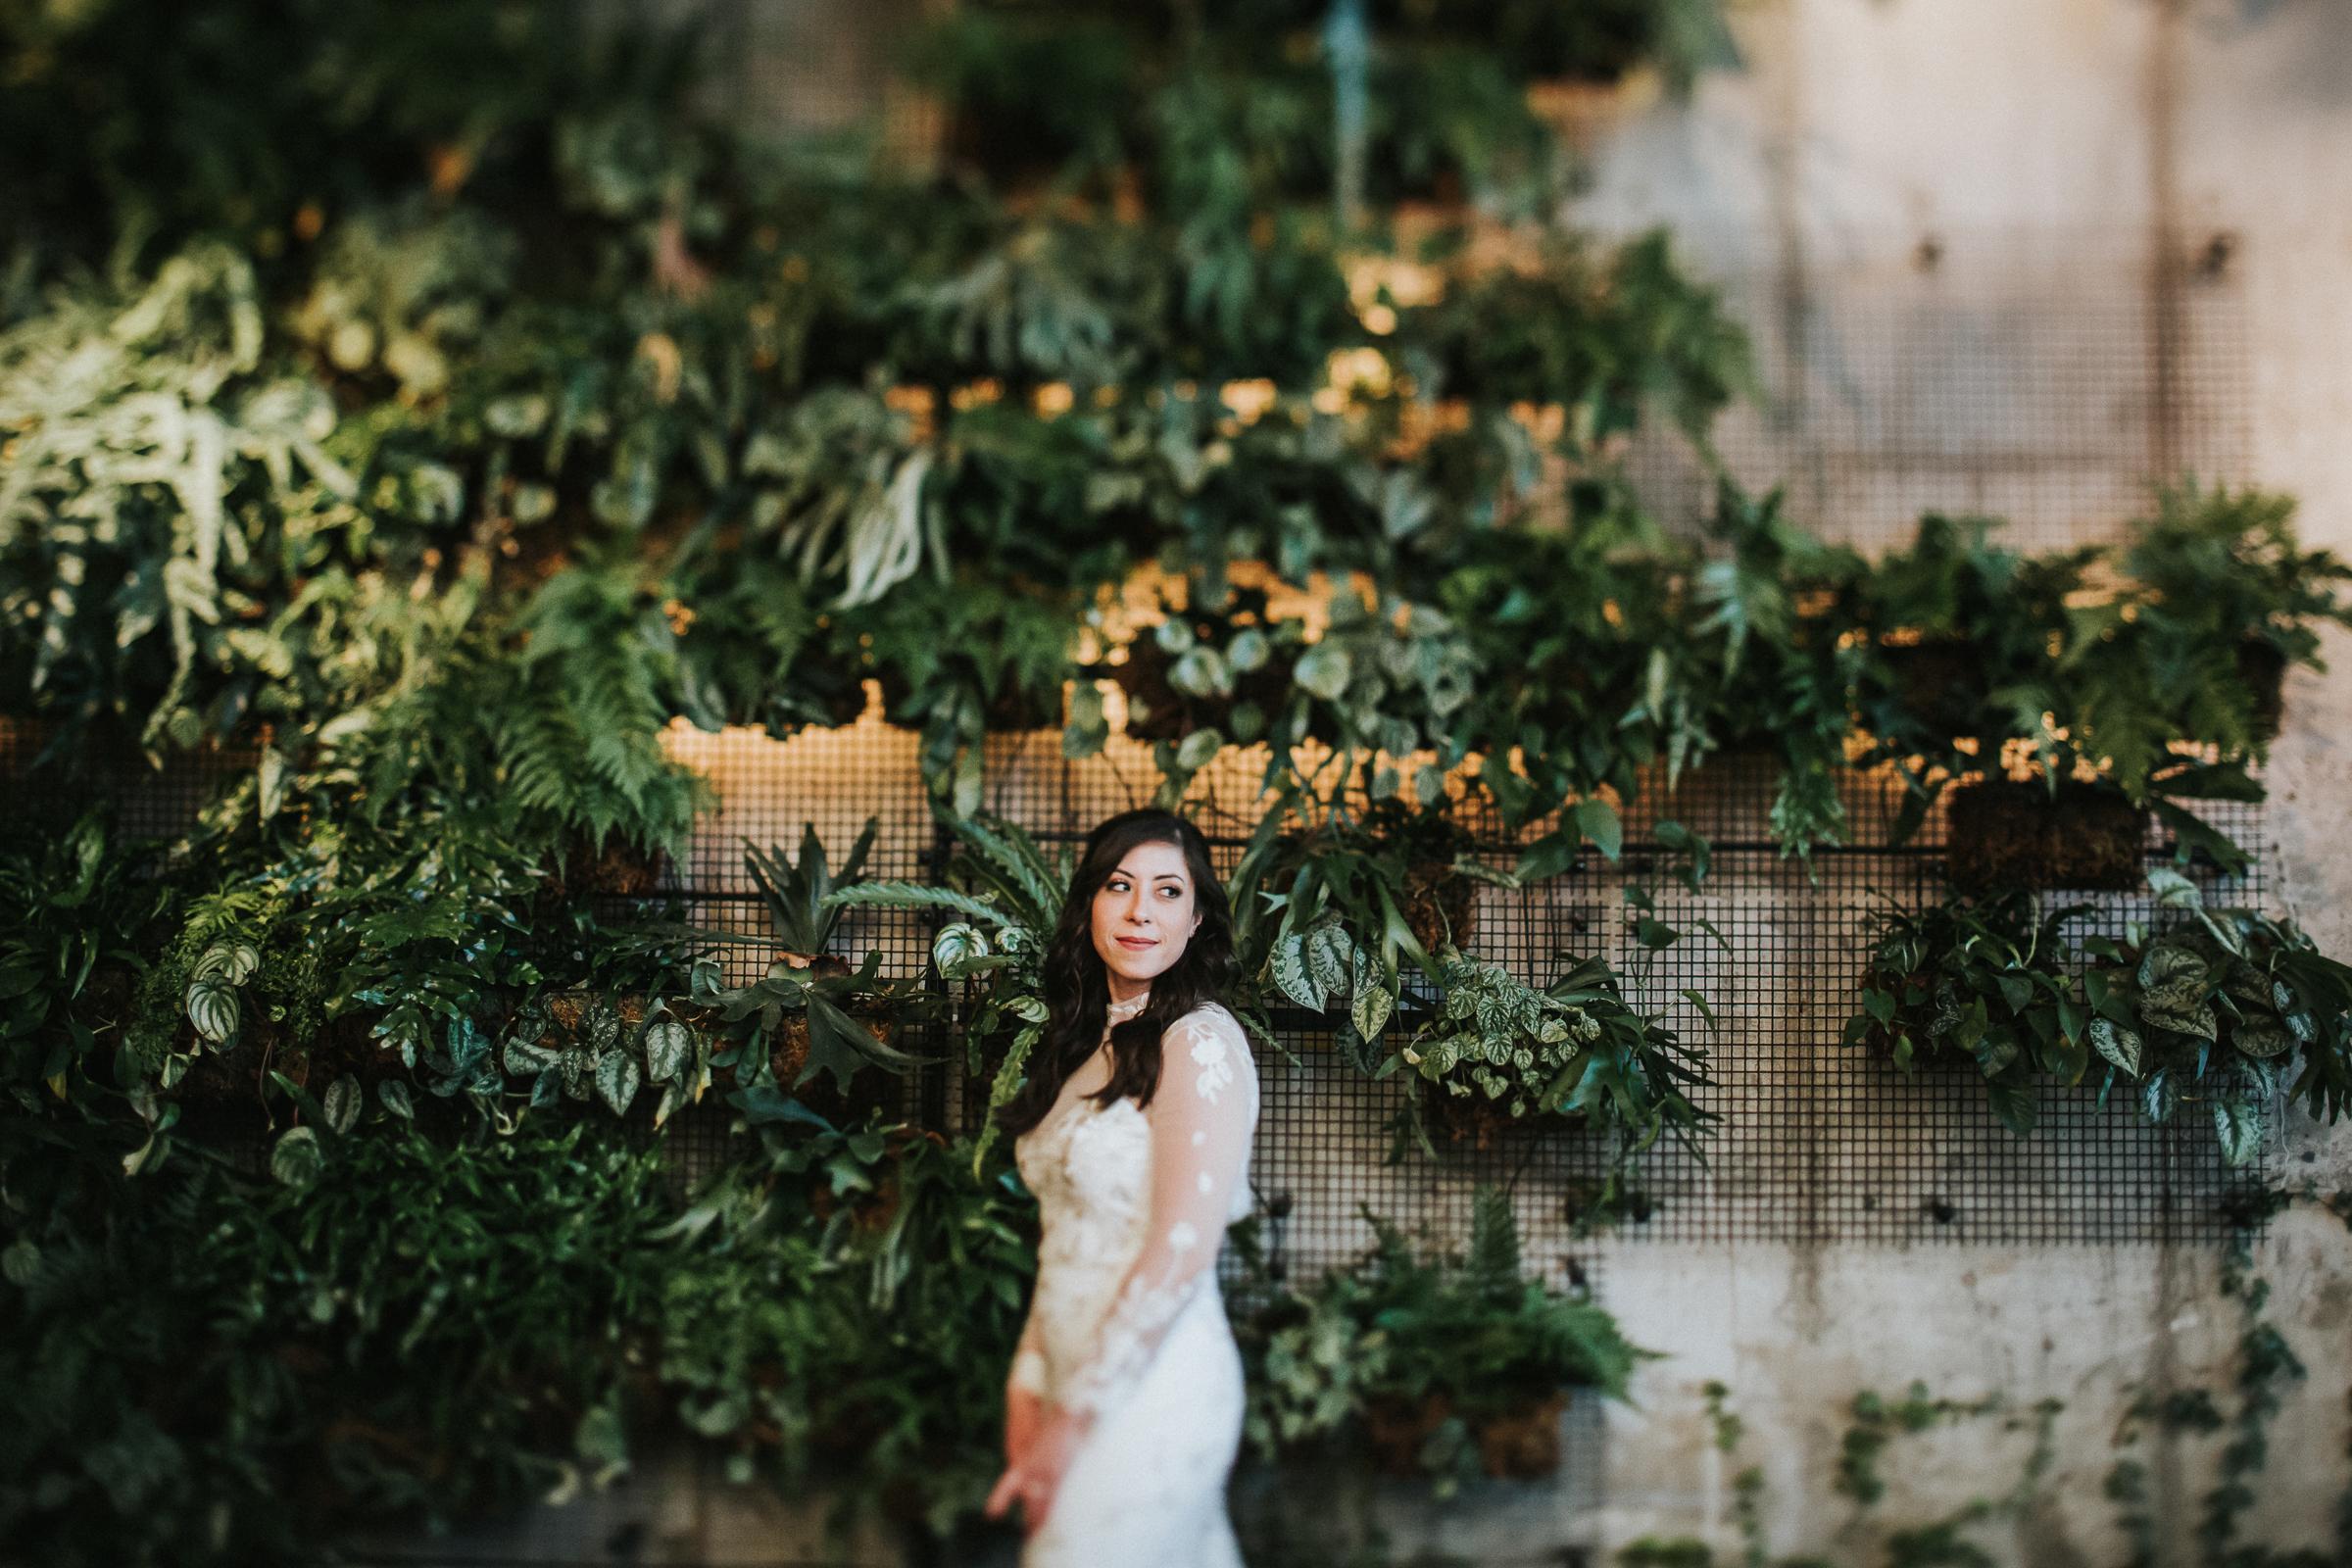 Brooklyn-Winery-Documentary-Wedding-Photographer-Hotel-1-18.jpg